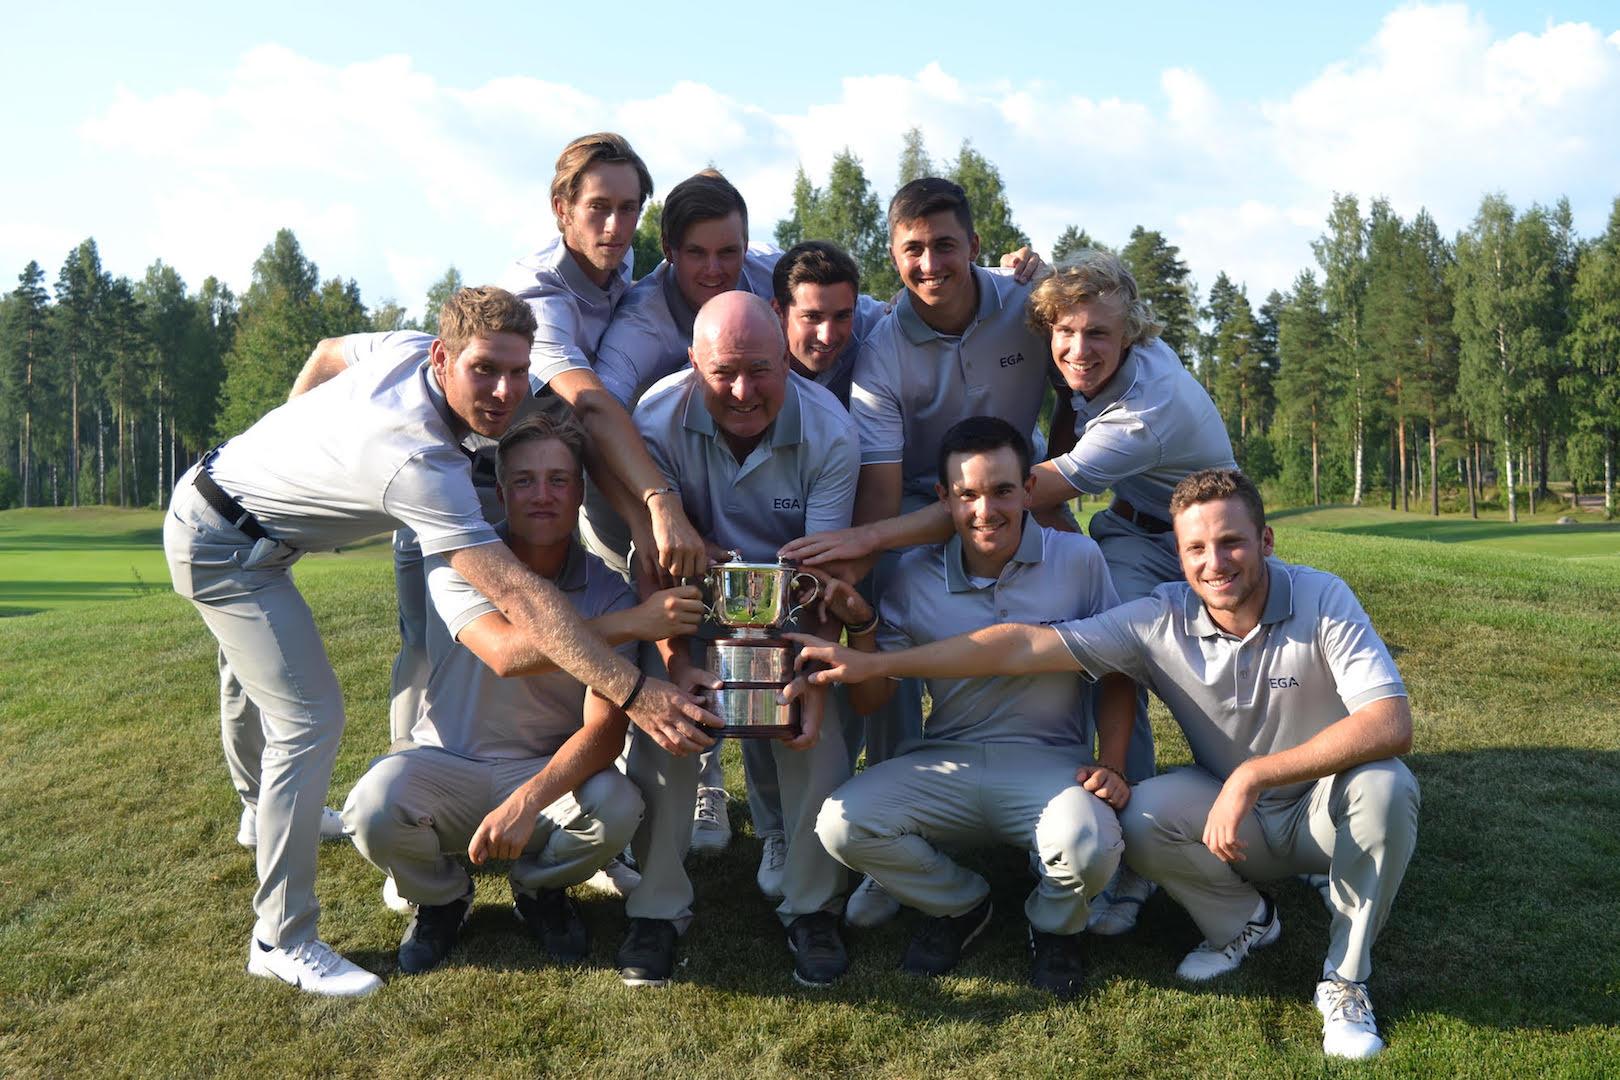 Linna Golf makes its mark on Europe's leading amateur golfers